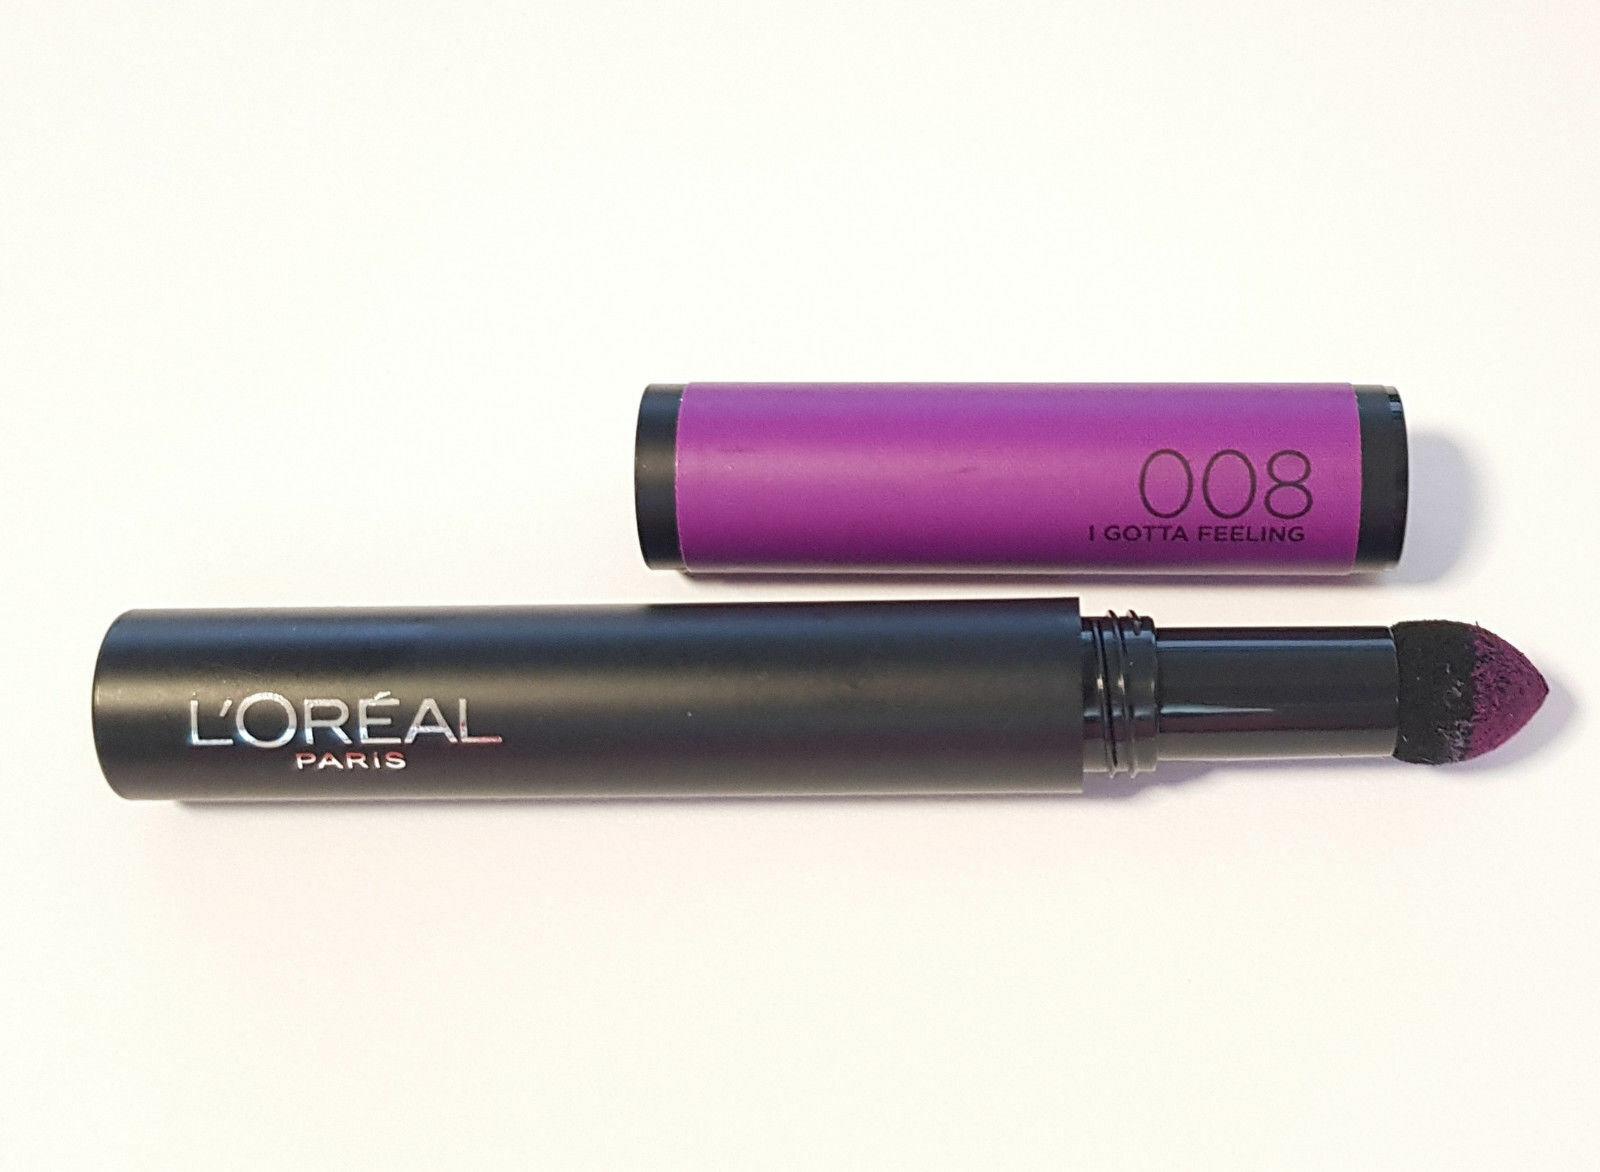 Loreal Puder Lipstick Lippenstift Infaillible Matte FX 008 I Gotta Feeling Neu